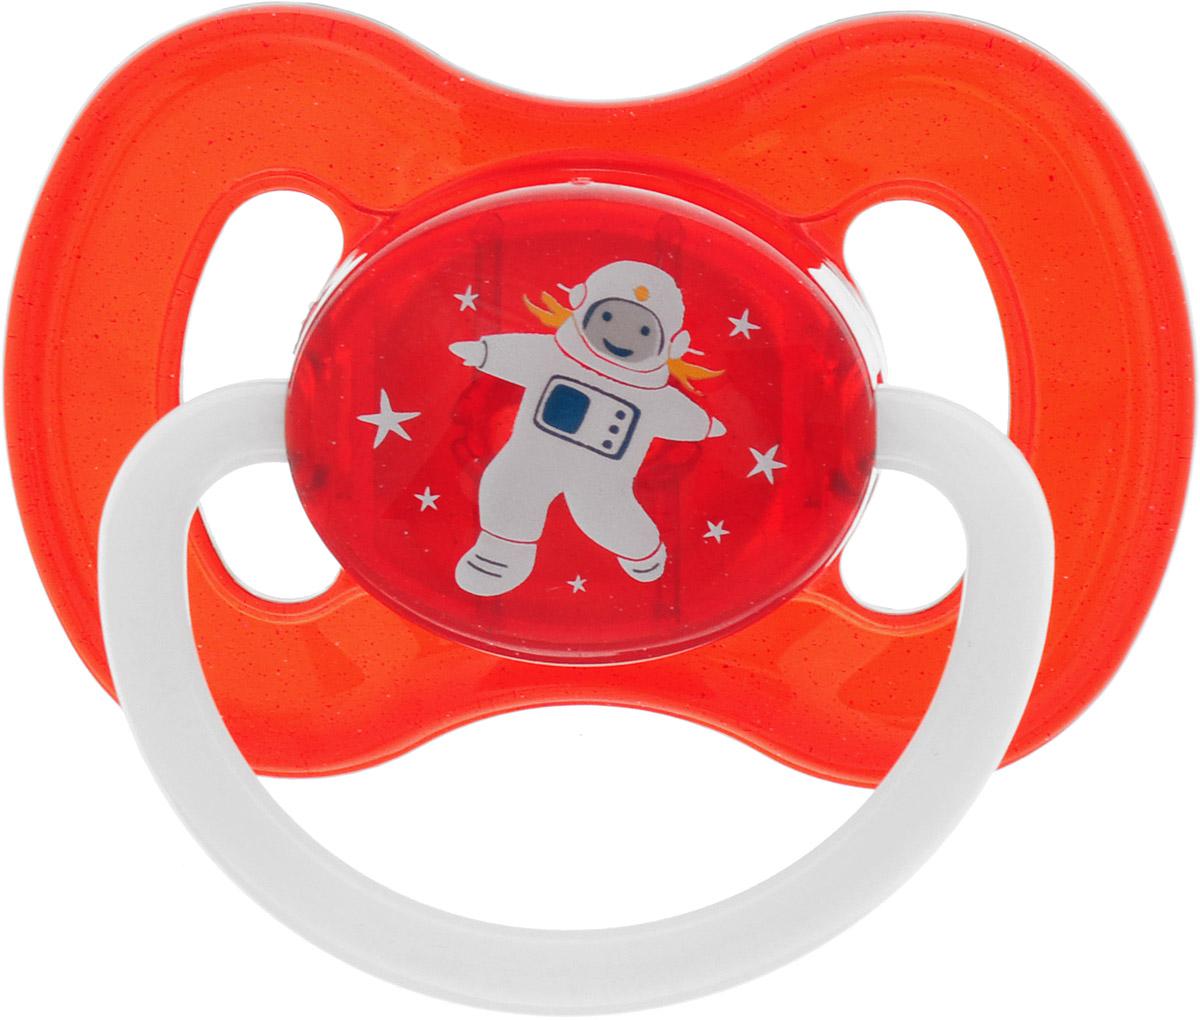 Canpol Babies Пустышка латексная Space Космонавт от 6 до 18 месяцев